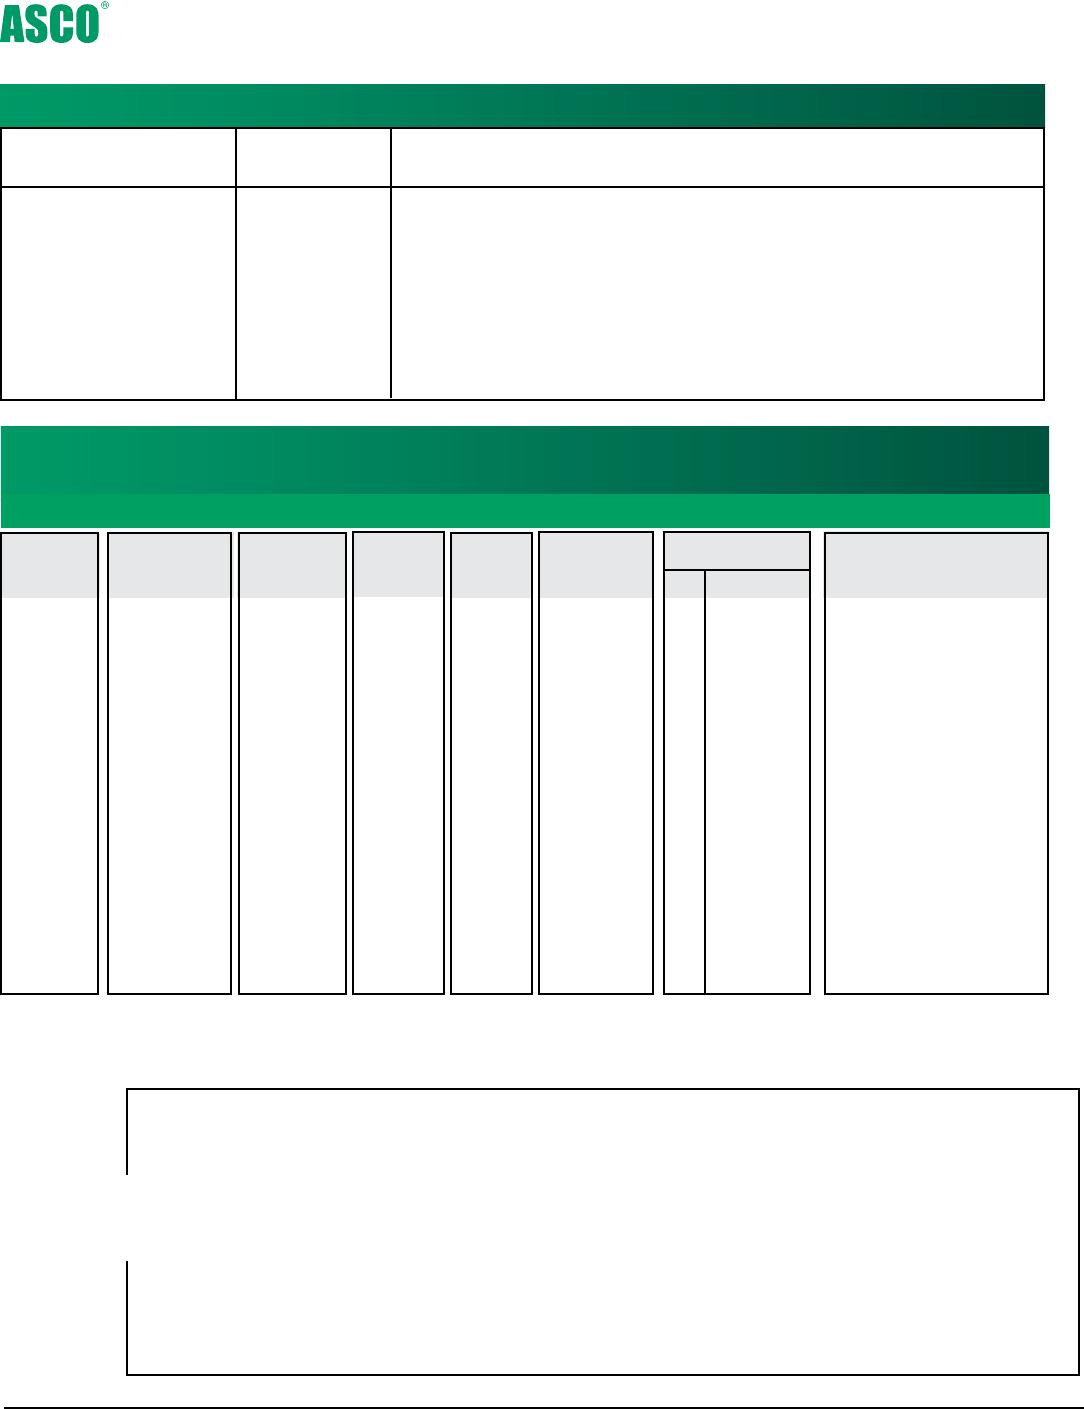 hight resolution of asco 641 lighting contactor panel